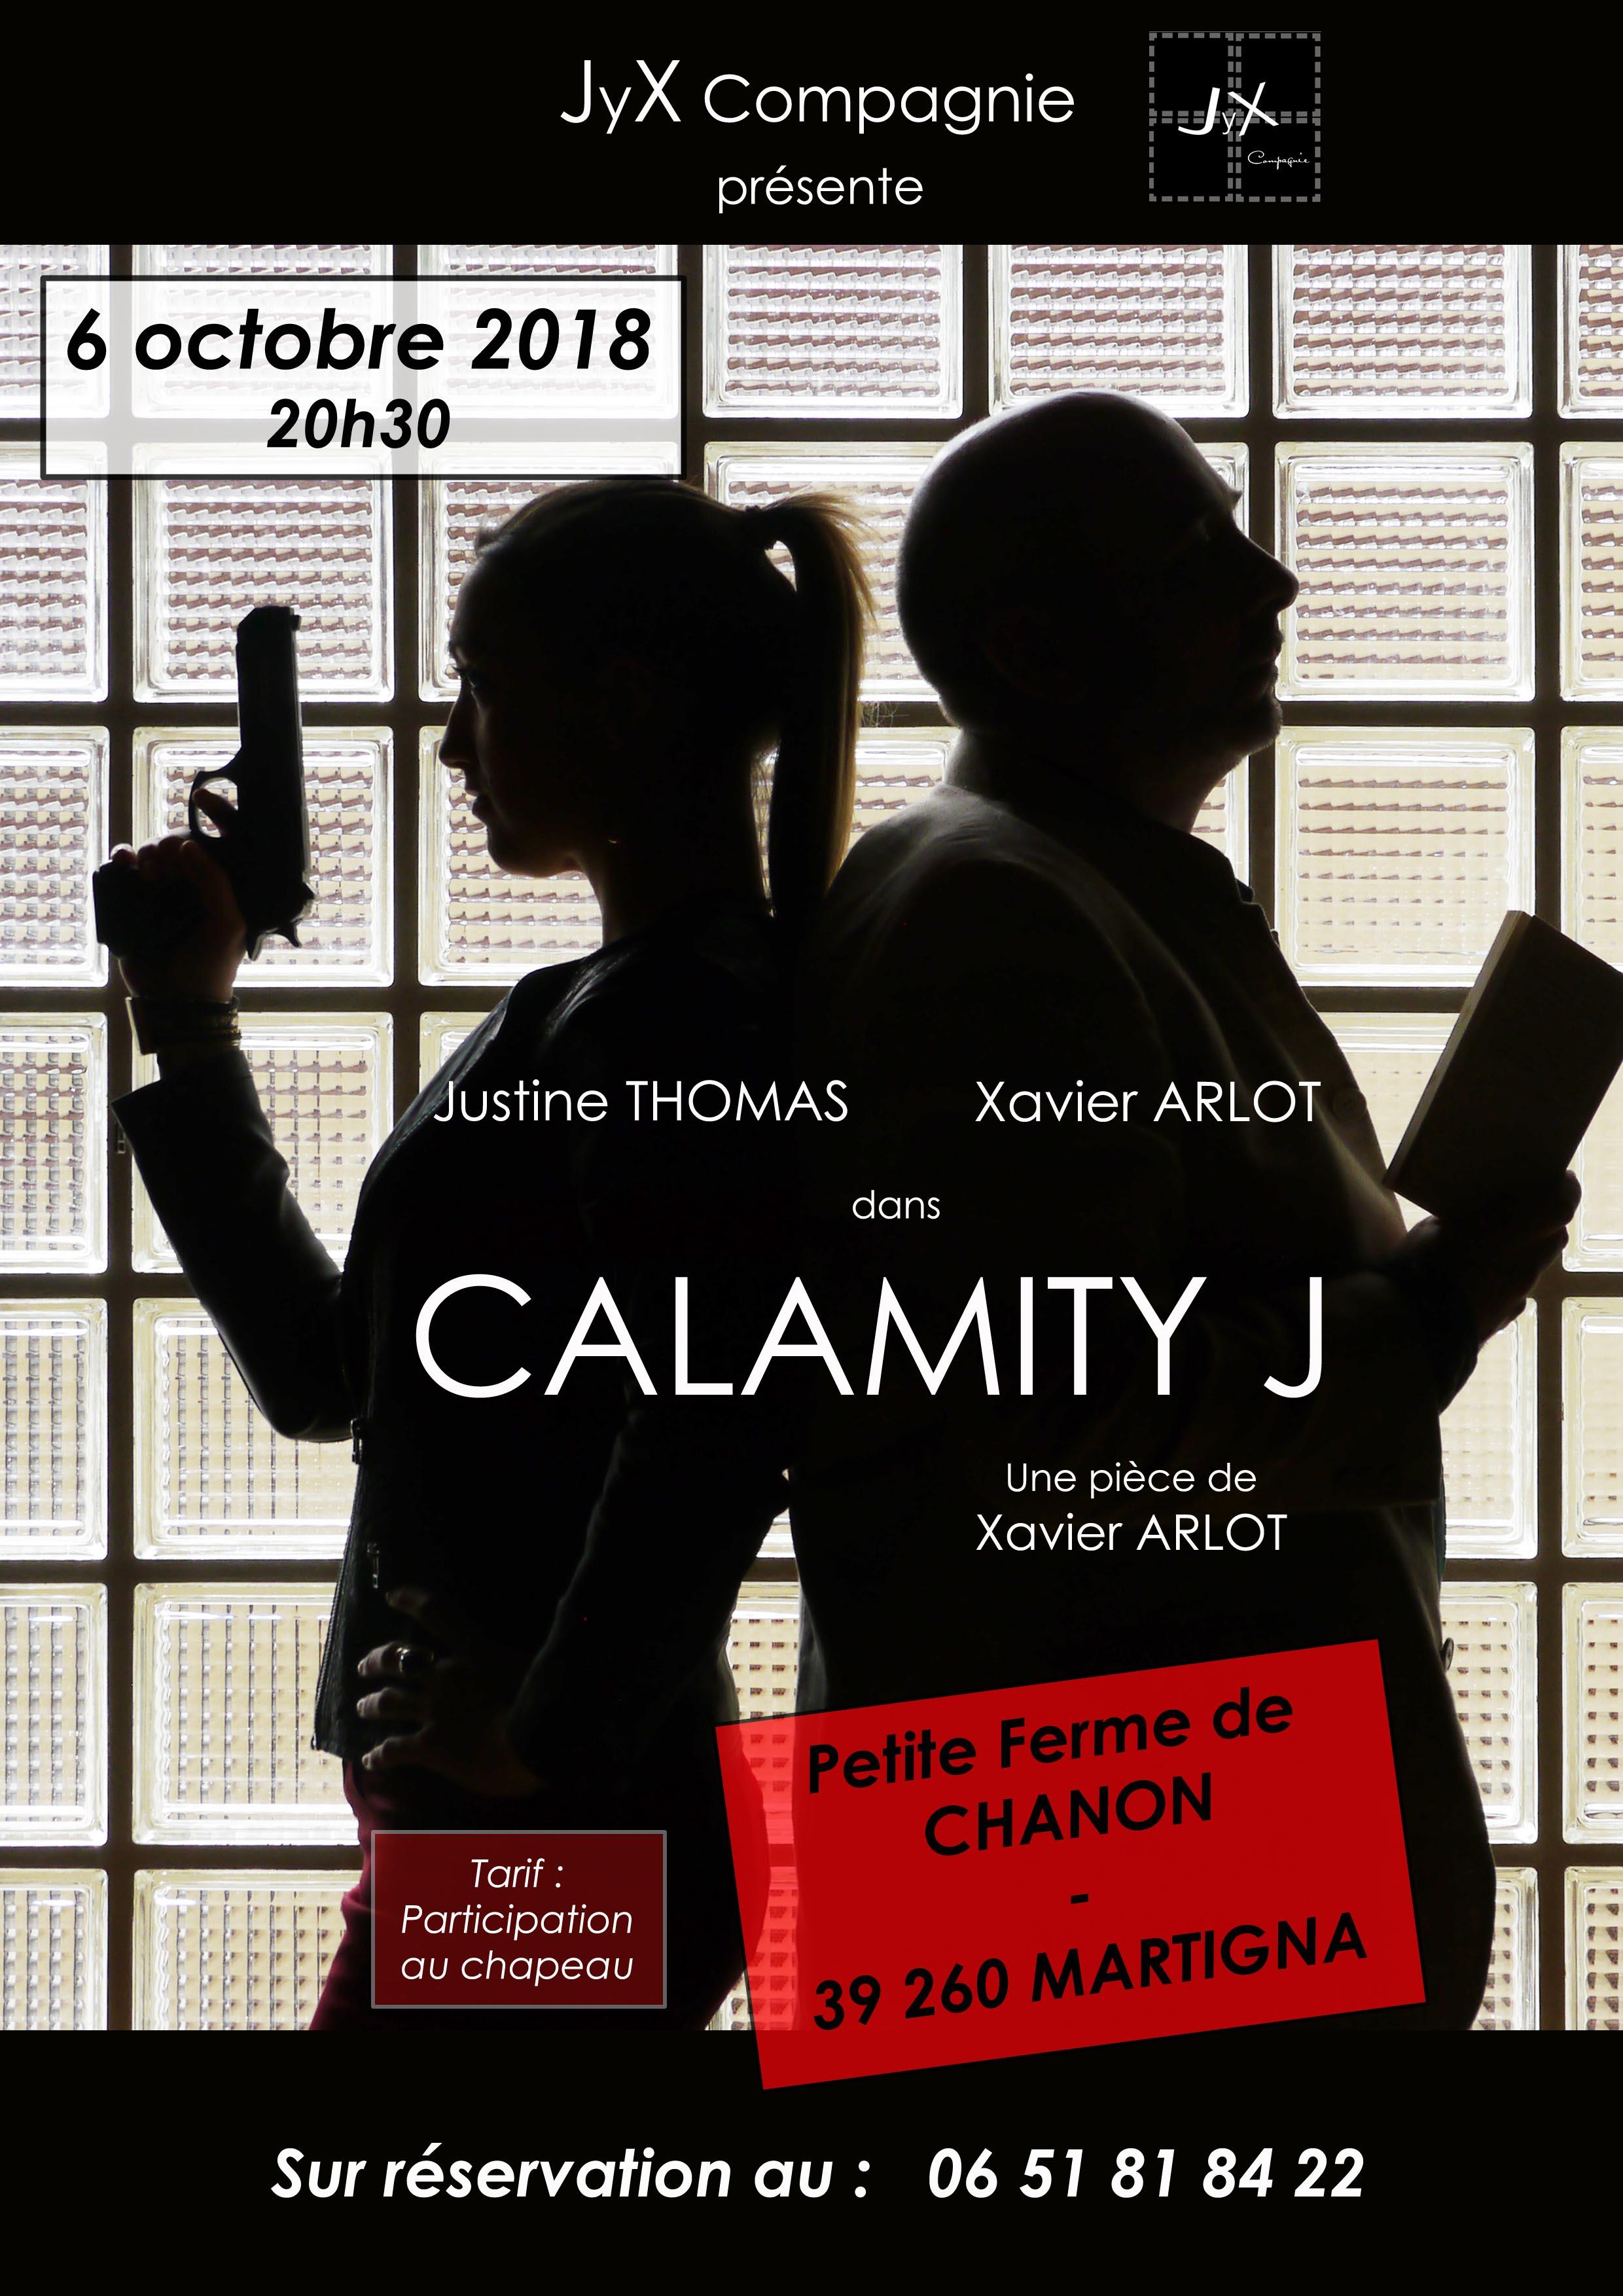 Calamity J - Affiche 21x29,7 - Chanon octobre - 02 - A (2).jpg